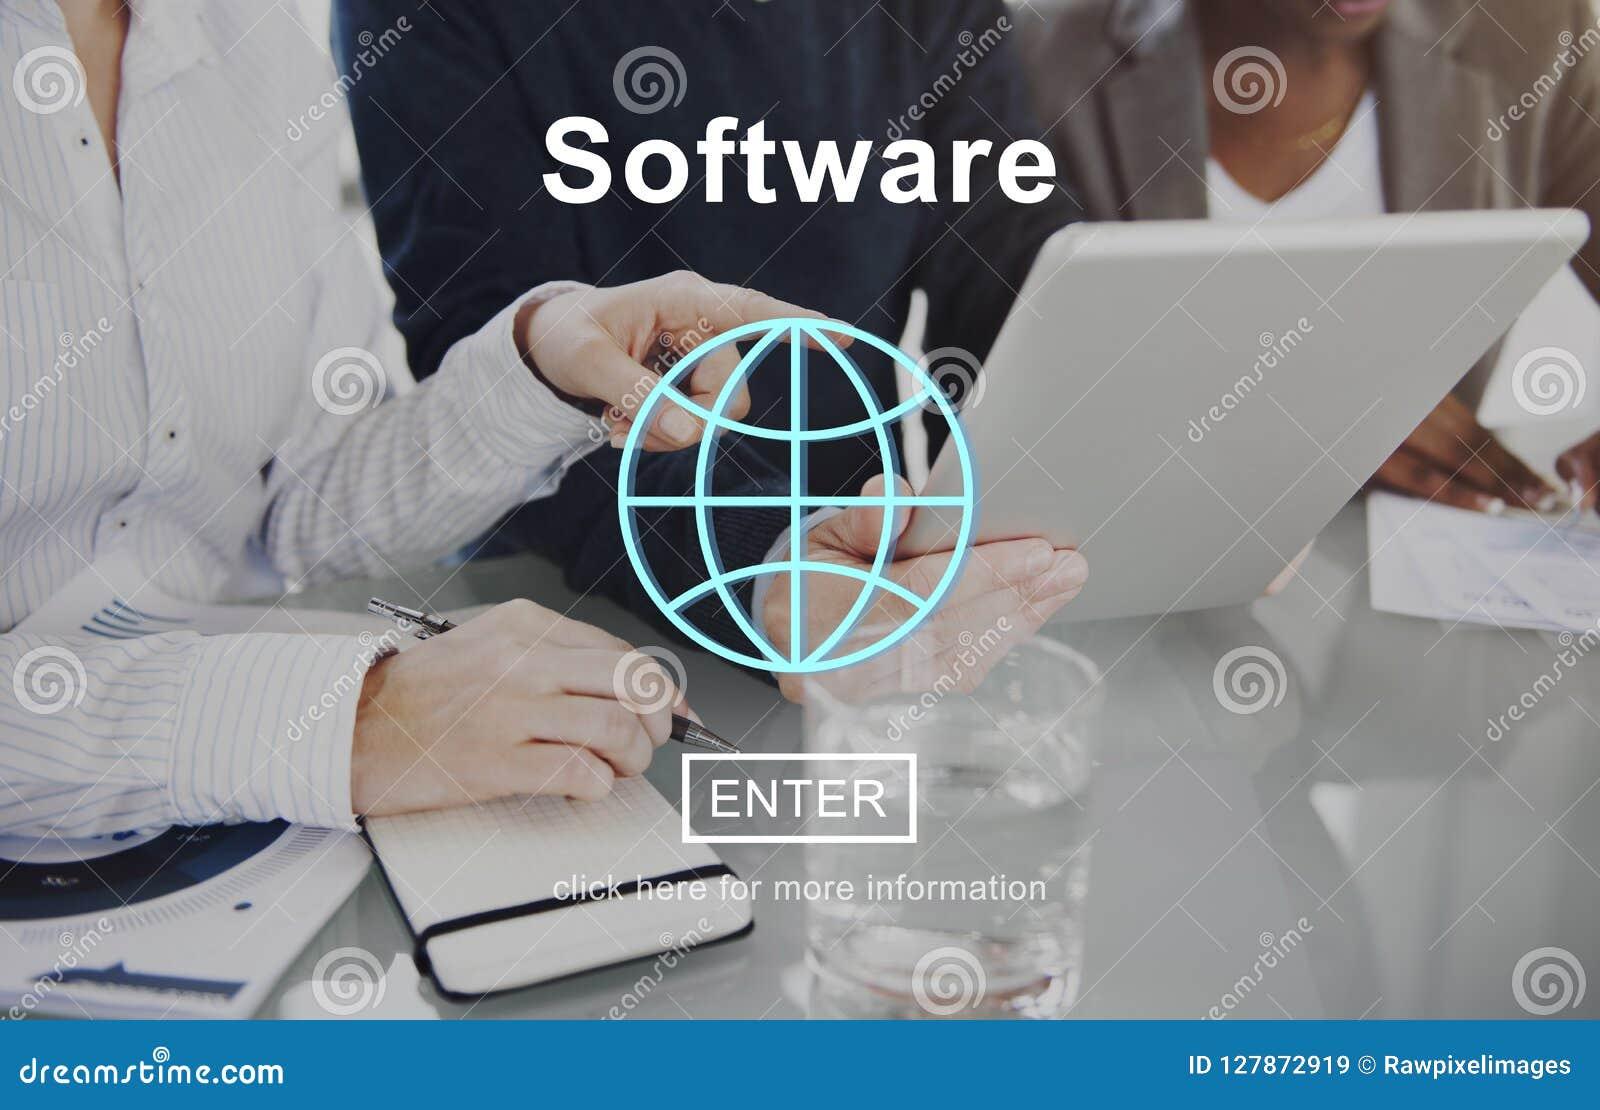 Software-Daten-Elektronik-System-Internet-Digital-Konzept